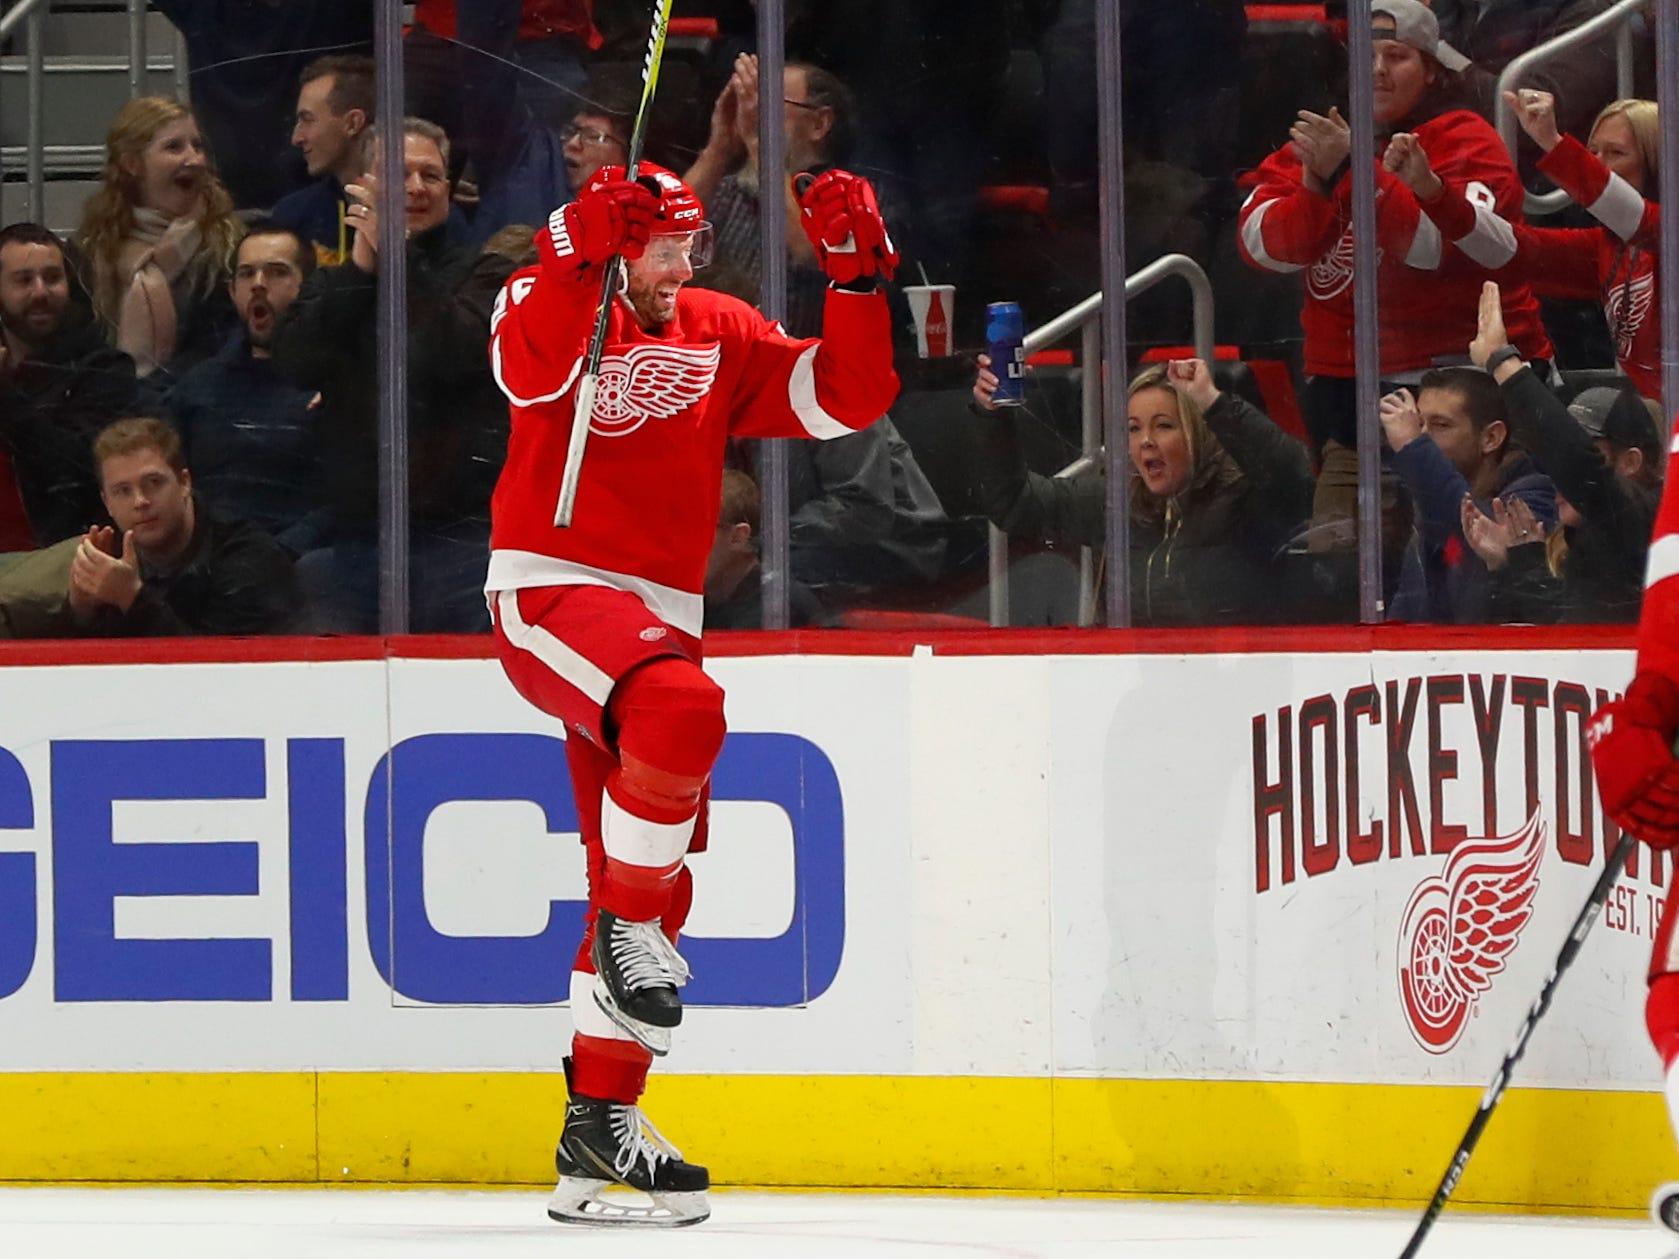 Detroit Red Wings' Thomas Vanek celebrates his goal against the Nashville Predators in the second period.